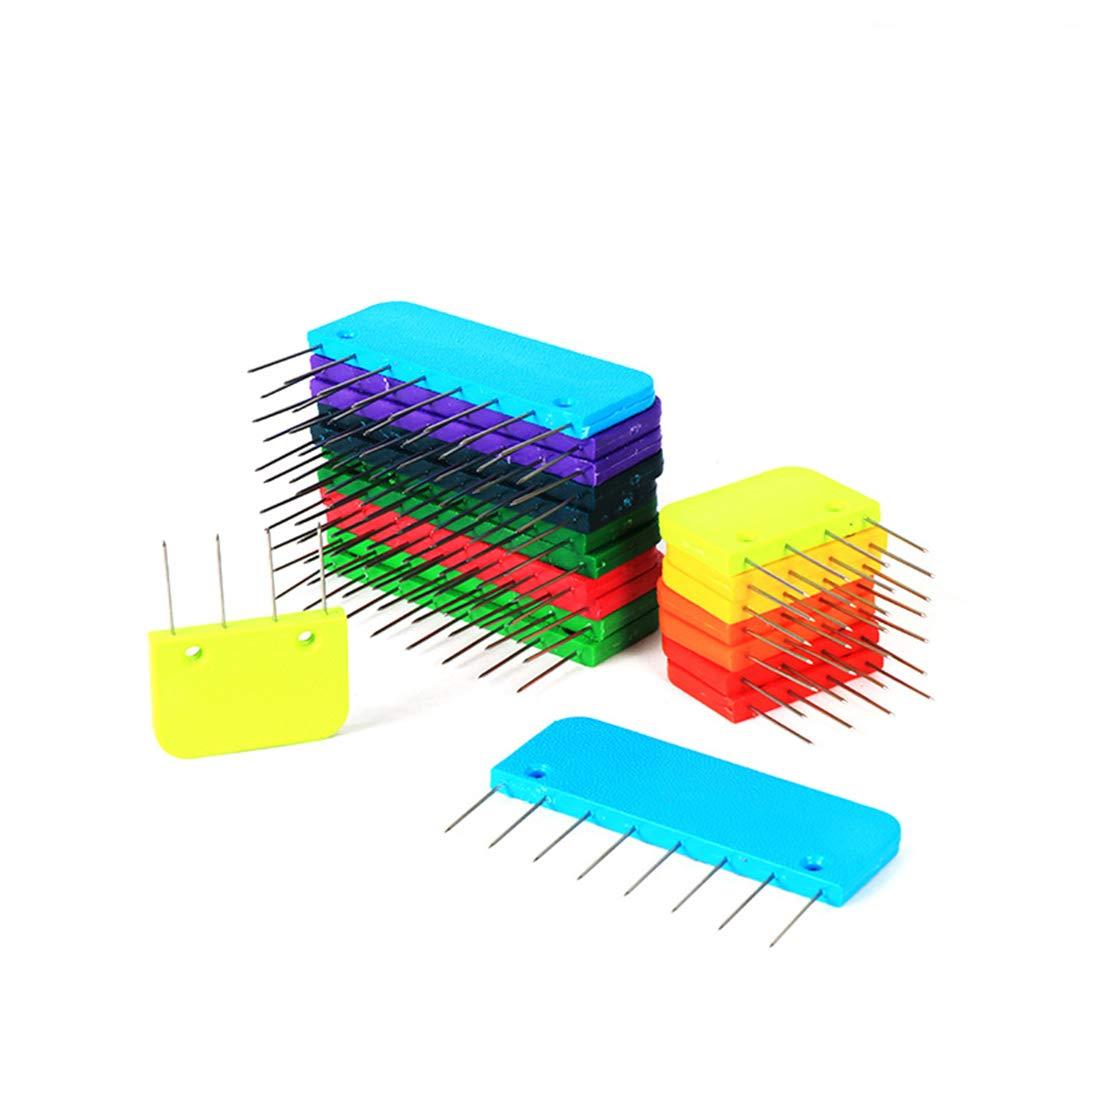 KnitPro Rainbow Knit Blockers for Handmade Crafts Knitting Accessories 10878